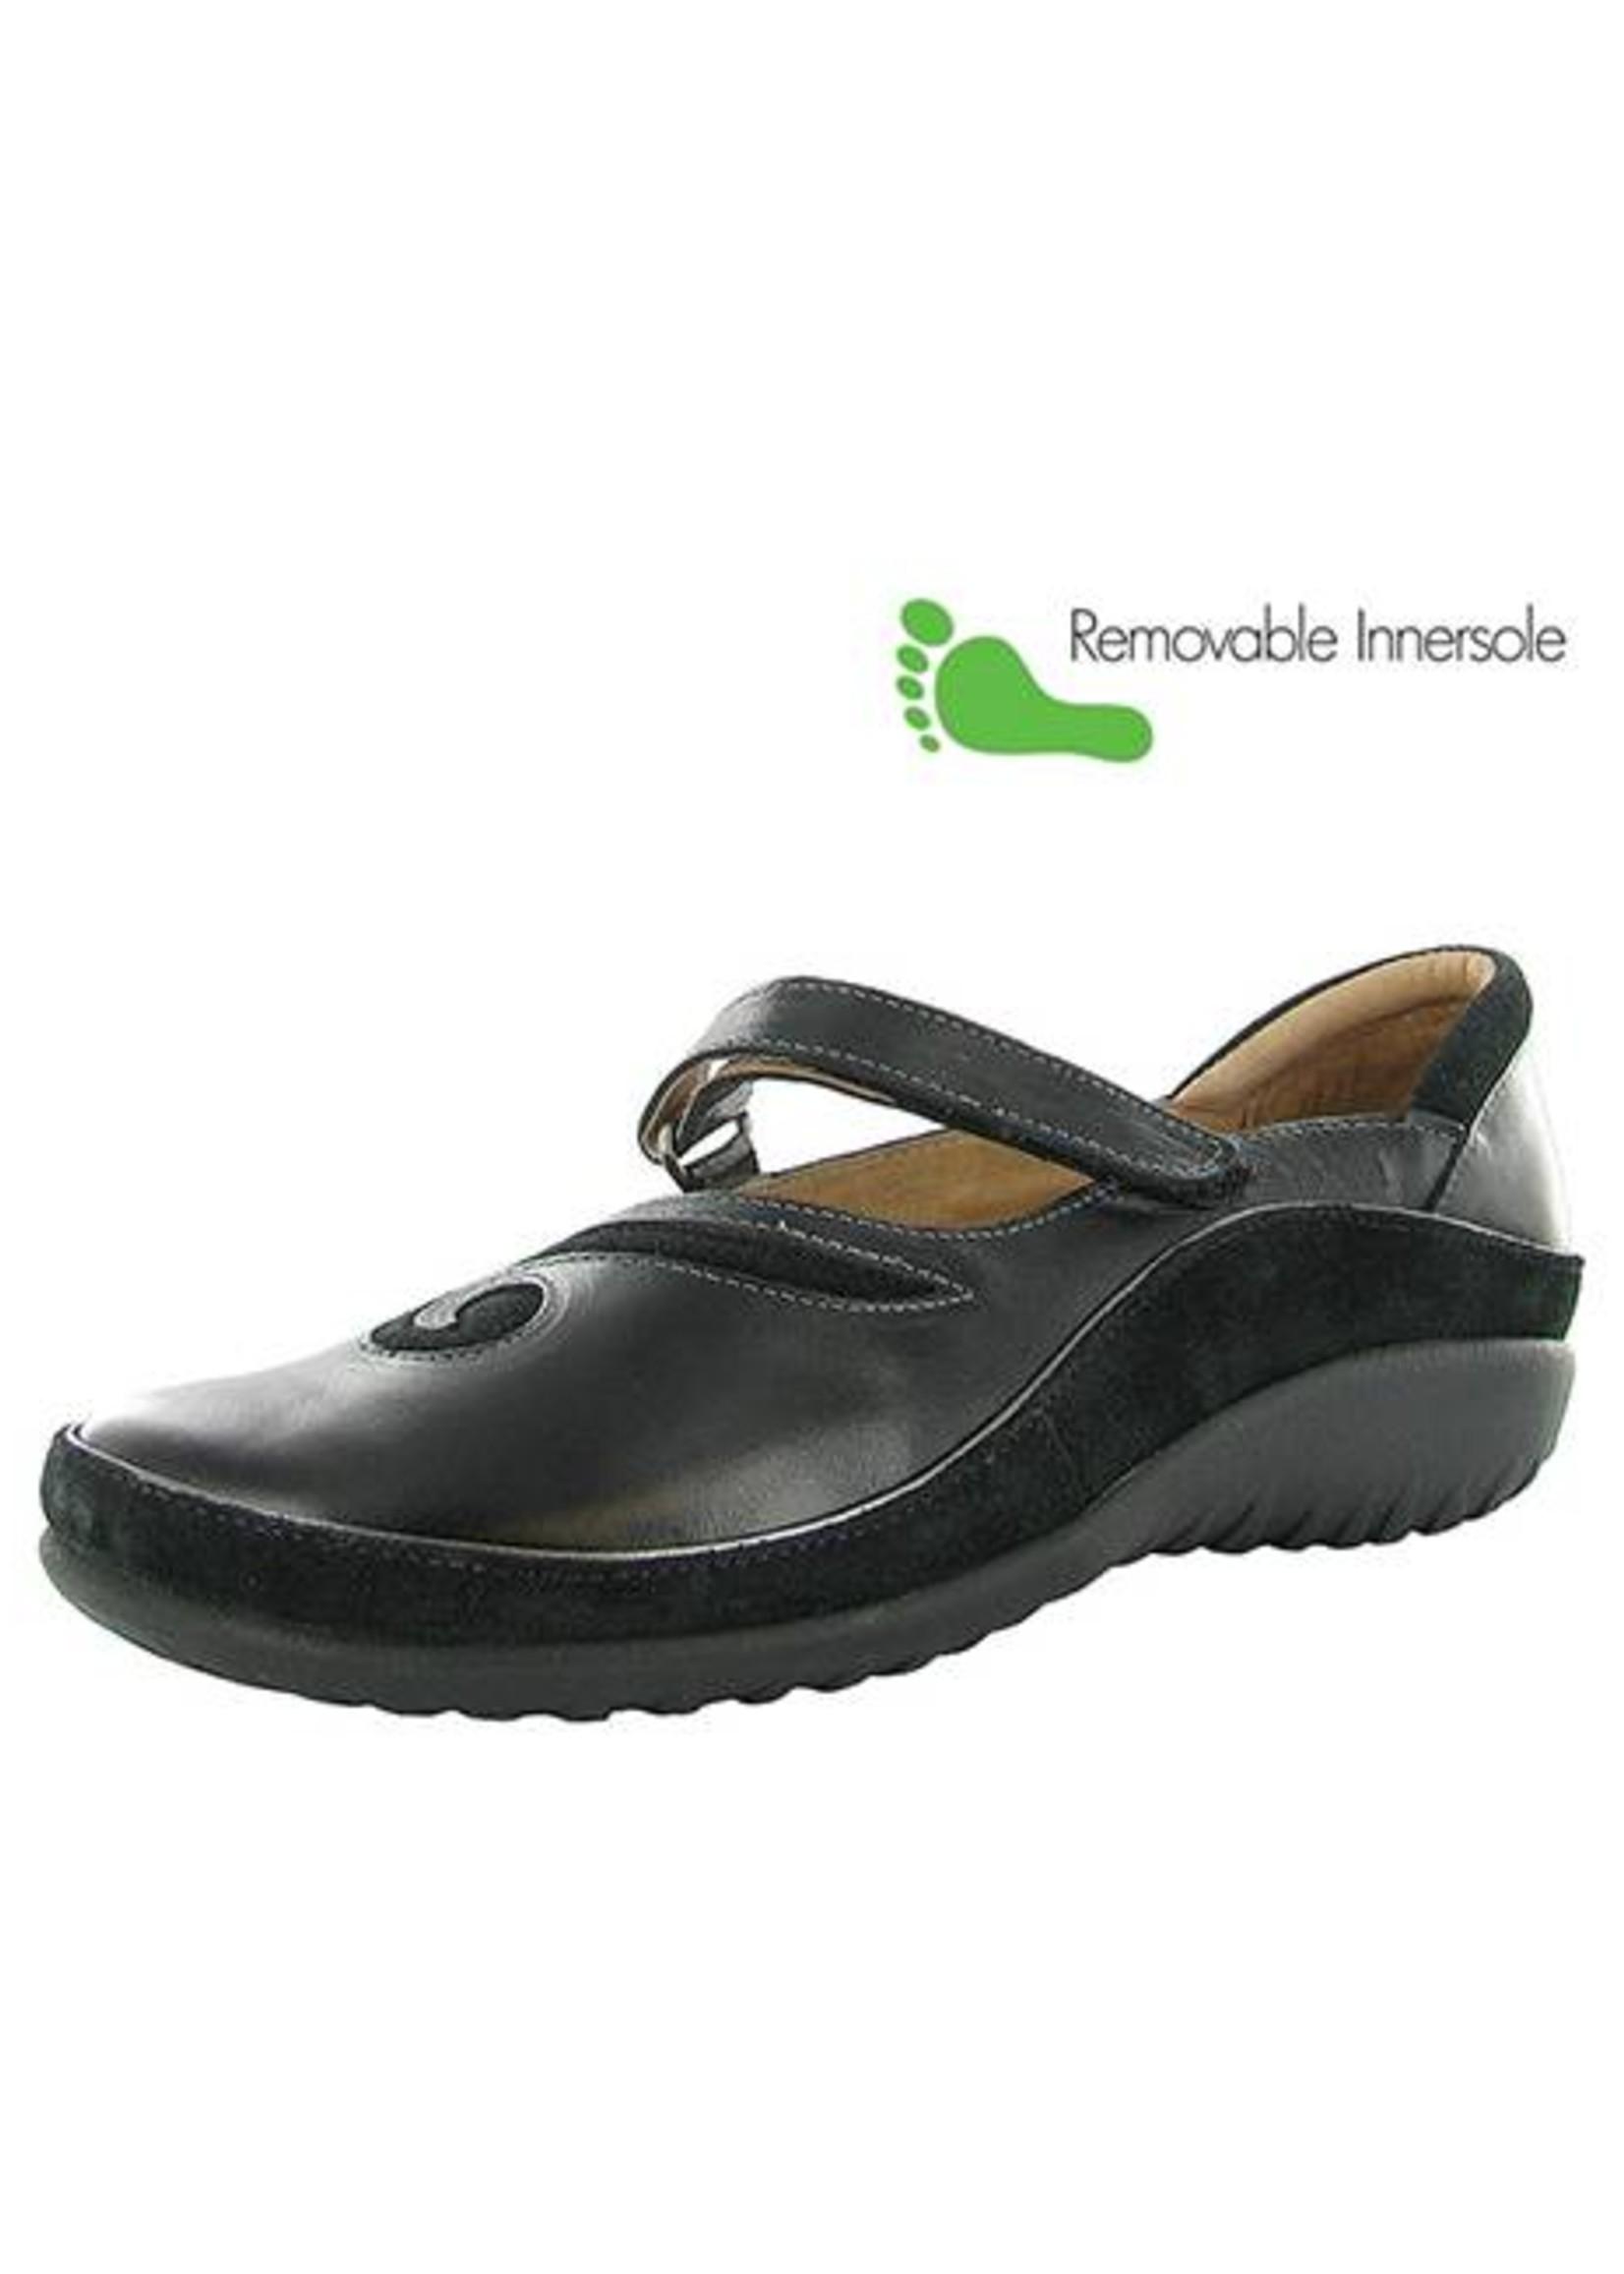 Naot Footwear Matai in Black Madras